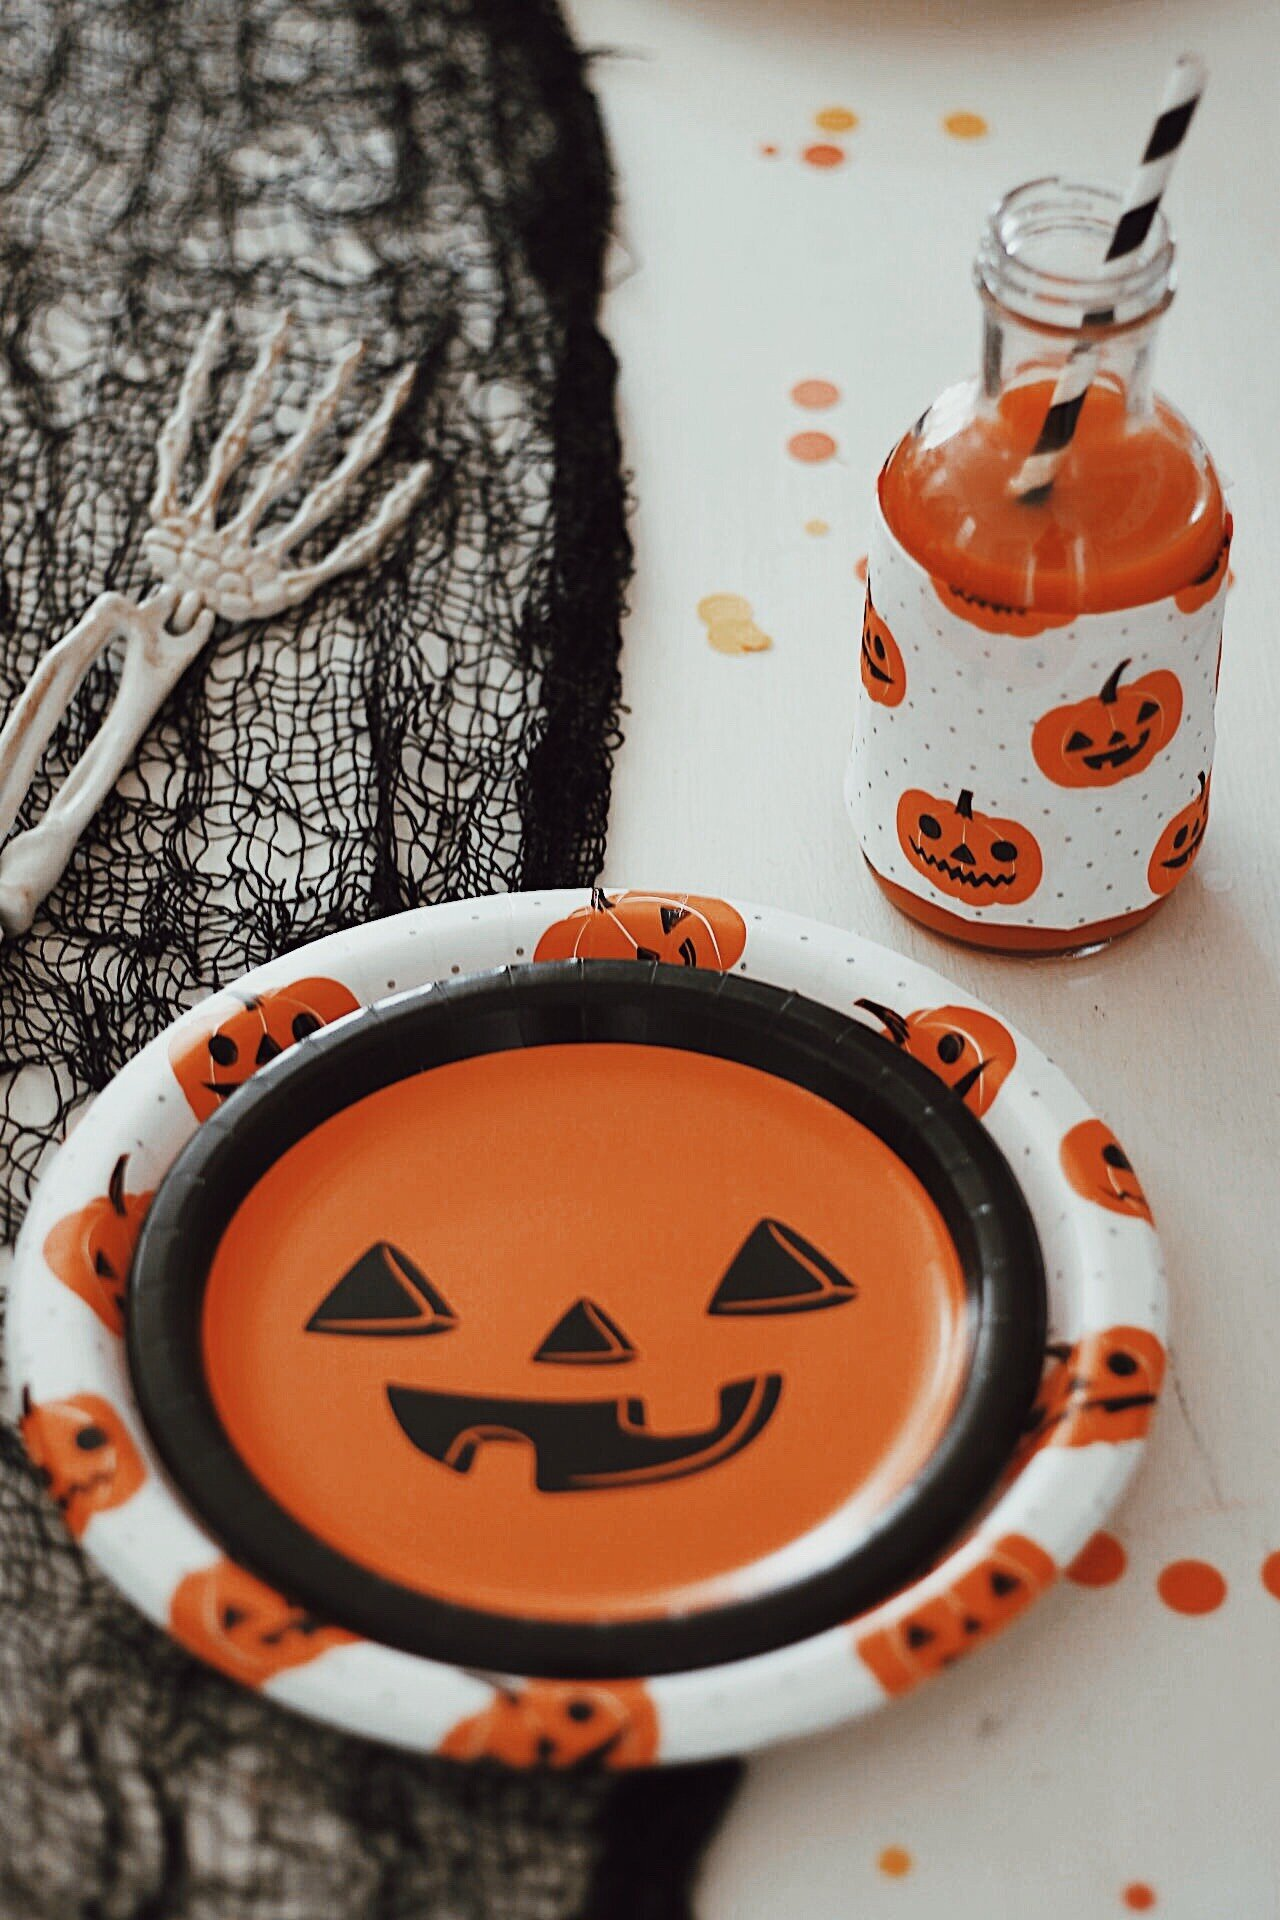 Halloween Candy-Halloween Party Ideas-Halloween Tablescape-www.SugarPartiesLA.com.jpeg